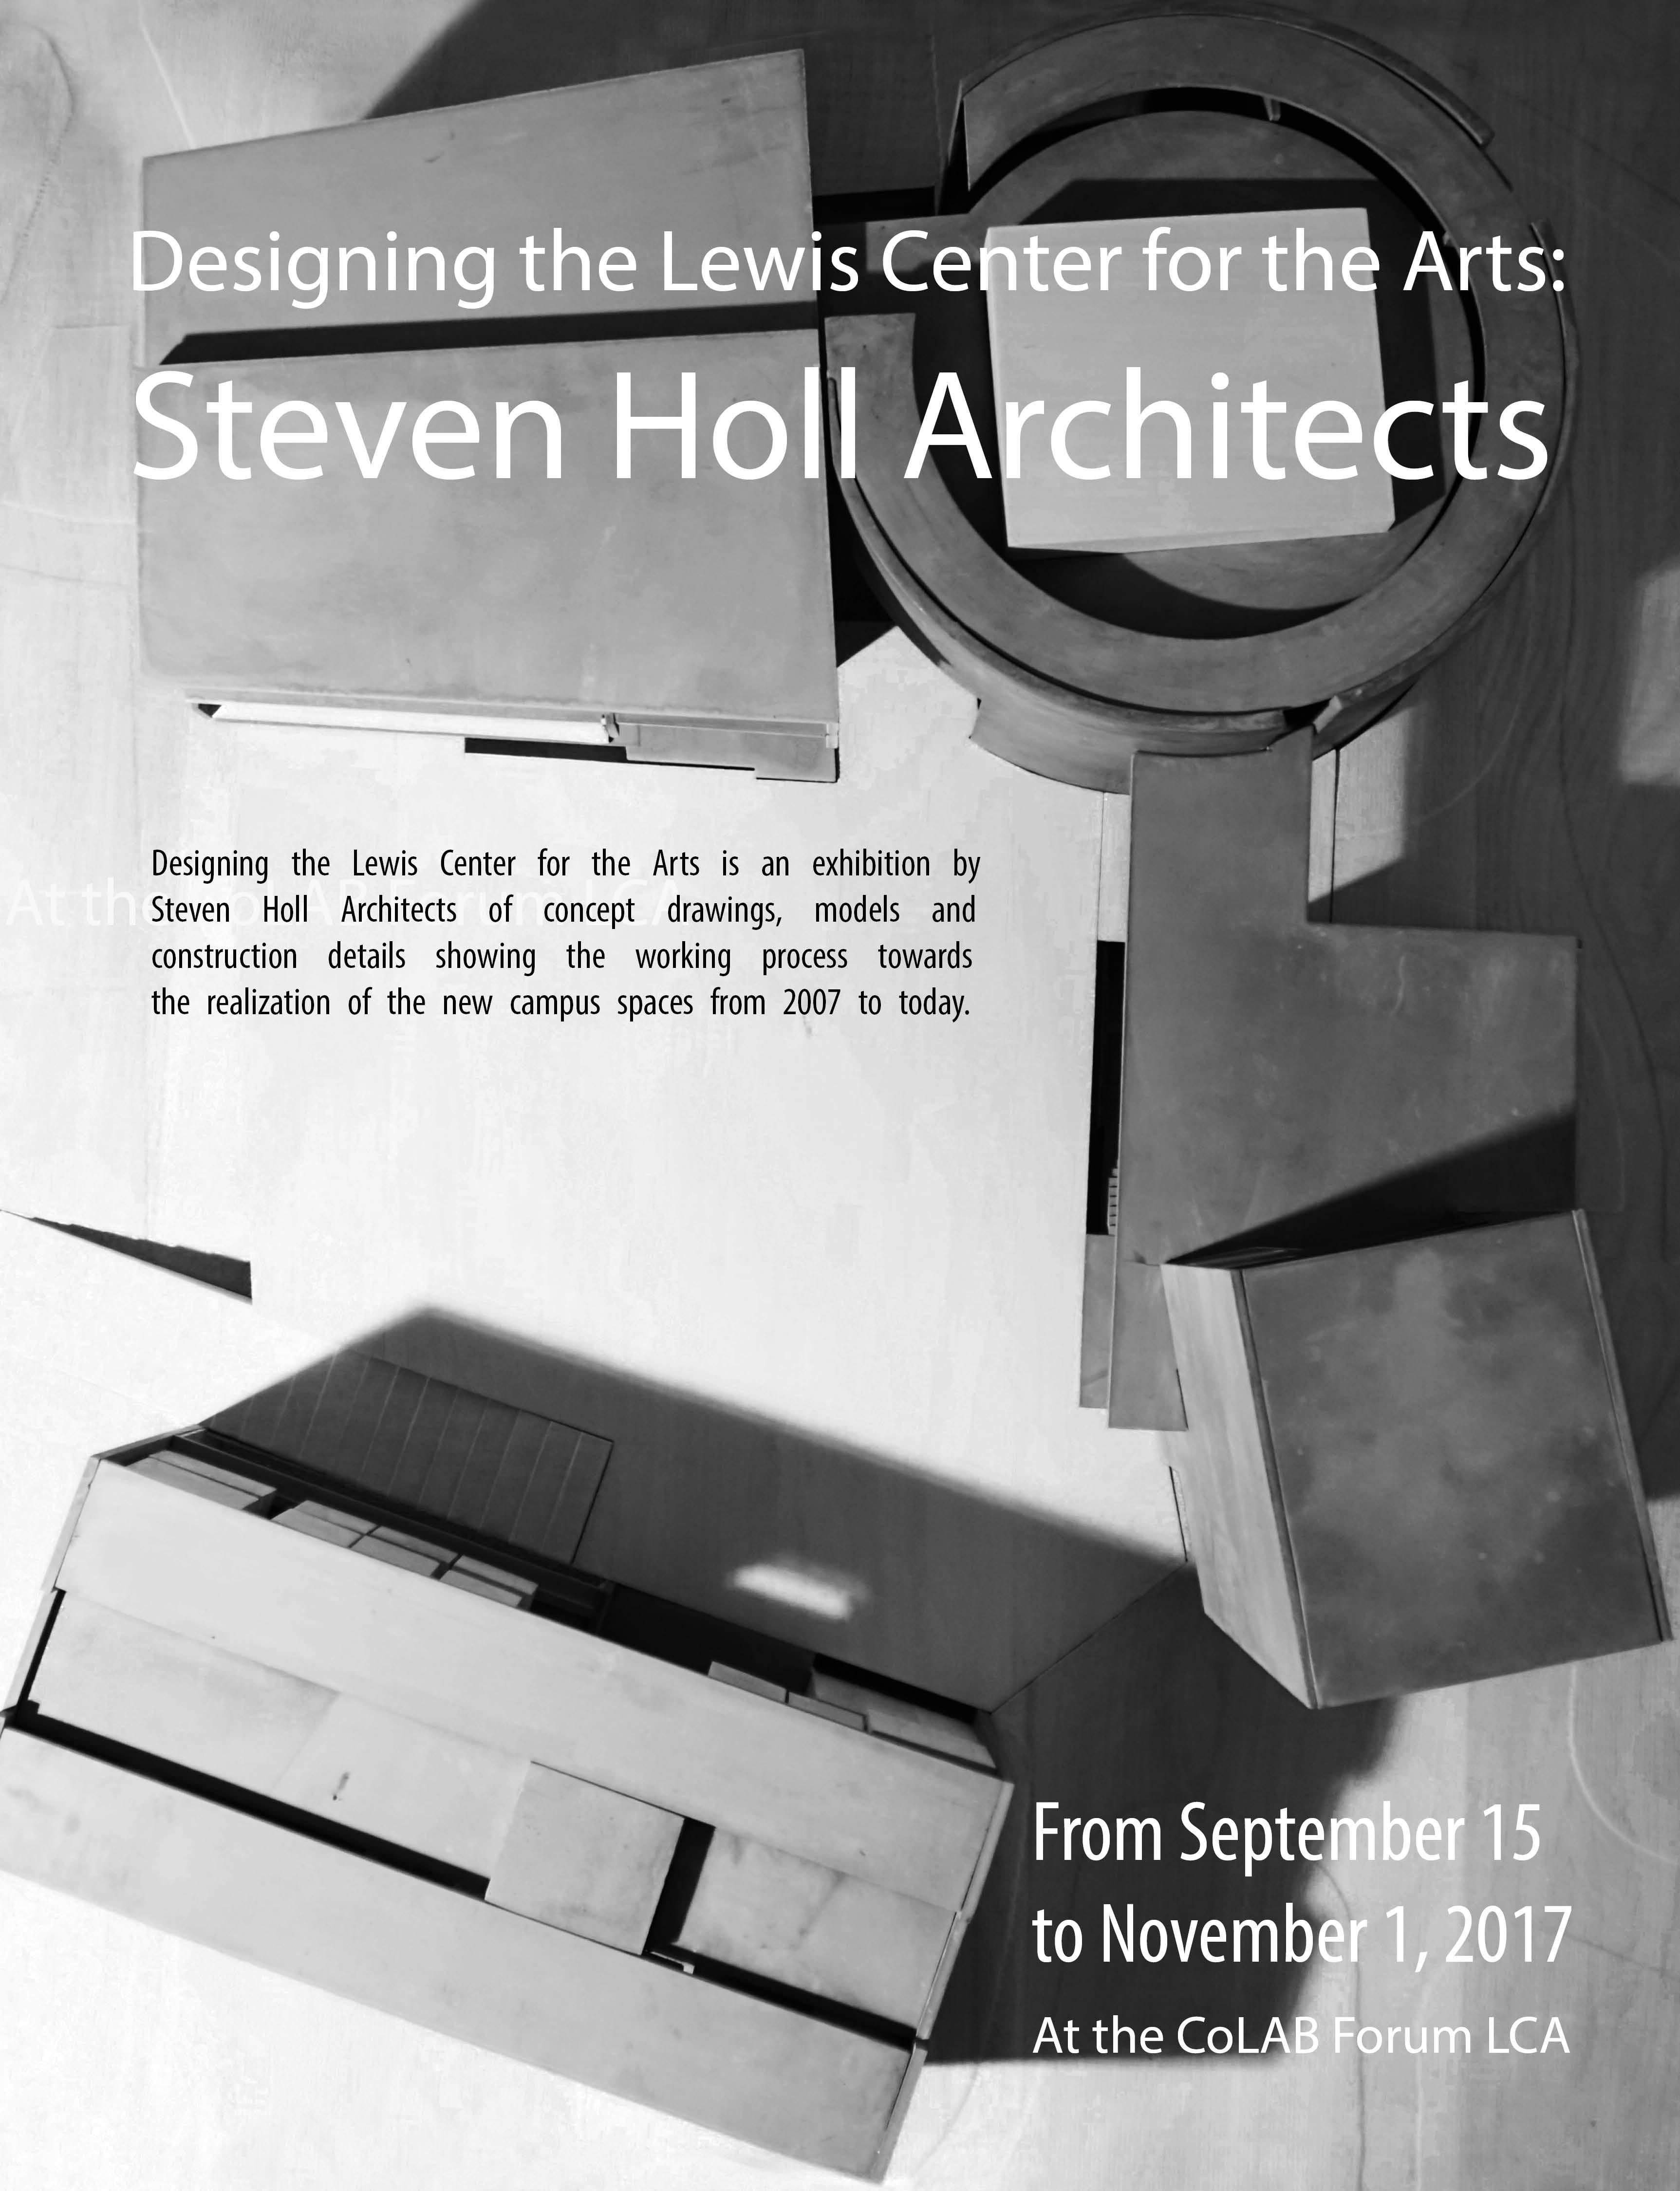 https://stevenholl.sfo2.digitaloceanspaces.com/uploads/exhibits/95283e6d8b9b02335ad05574c588eddf.jpg